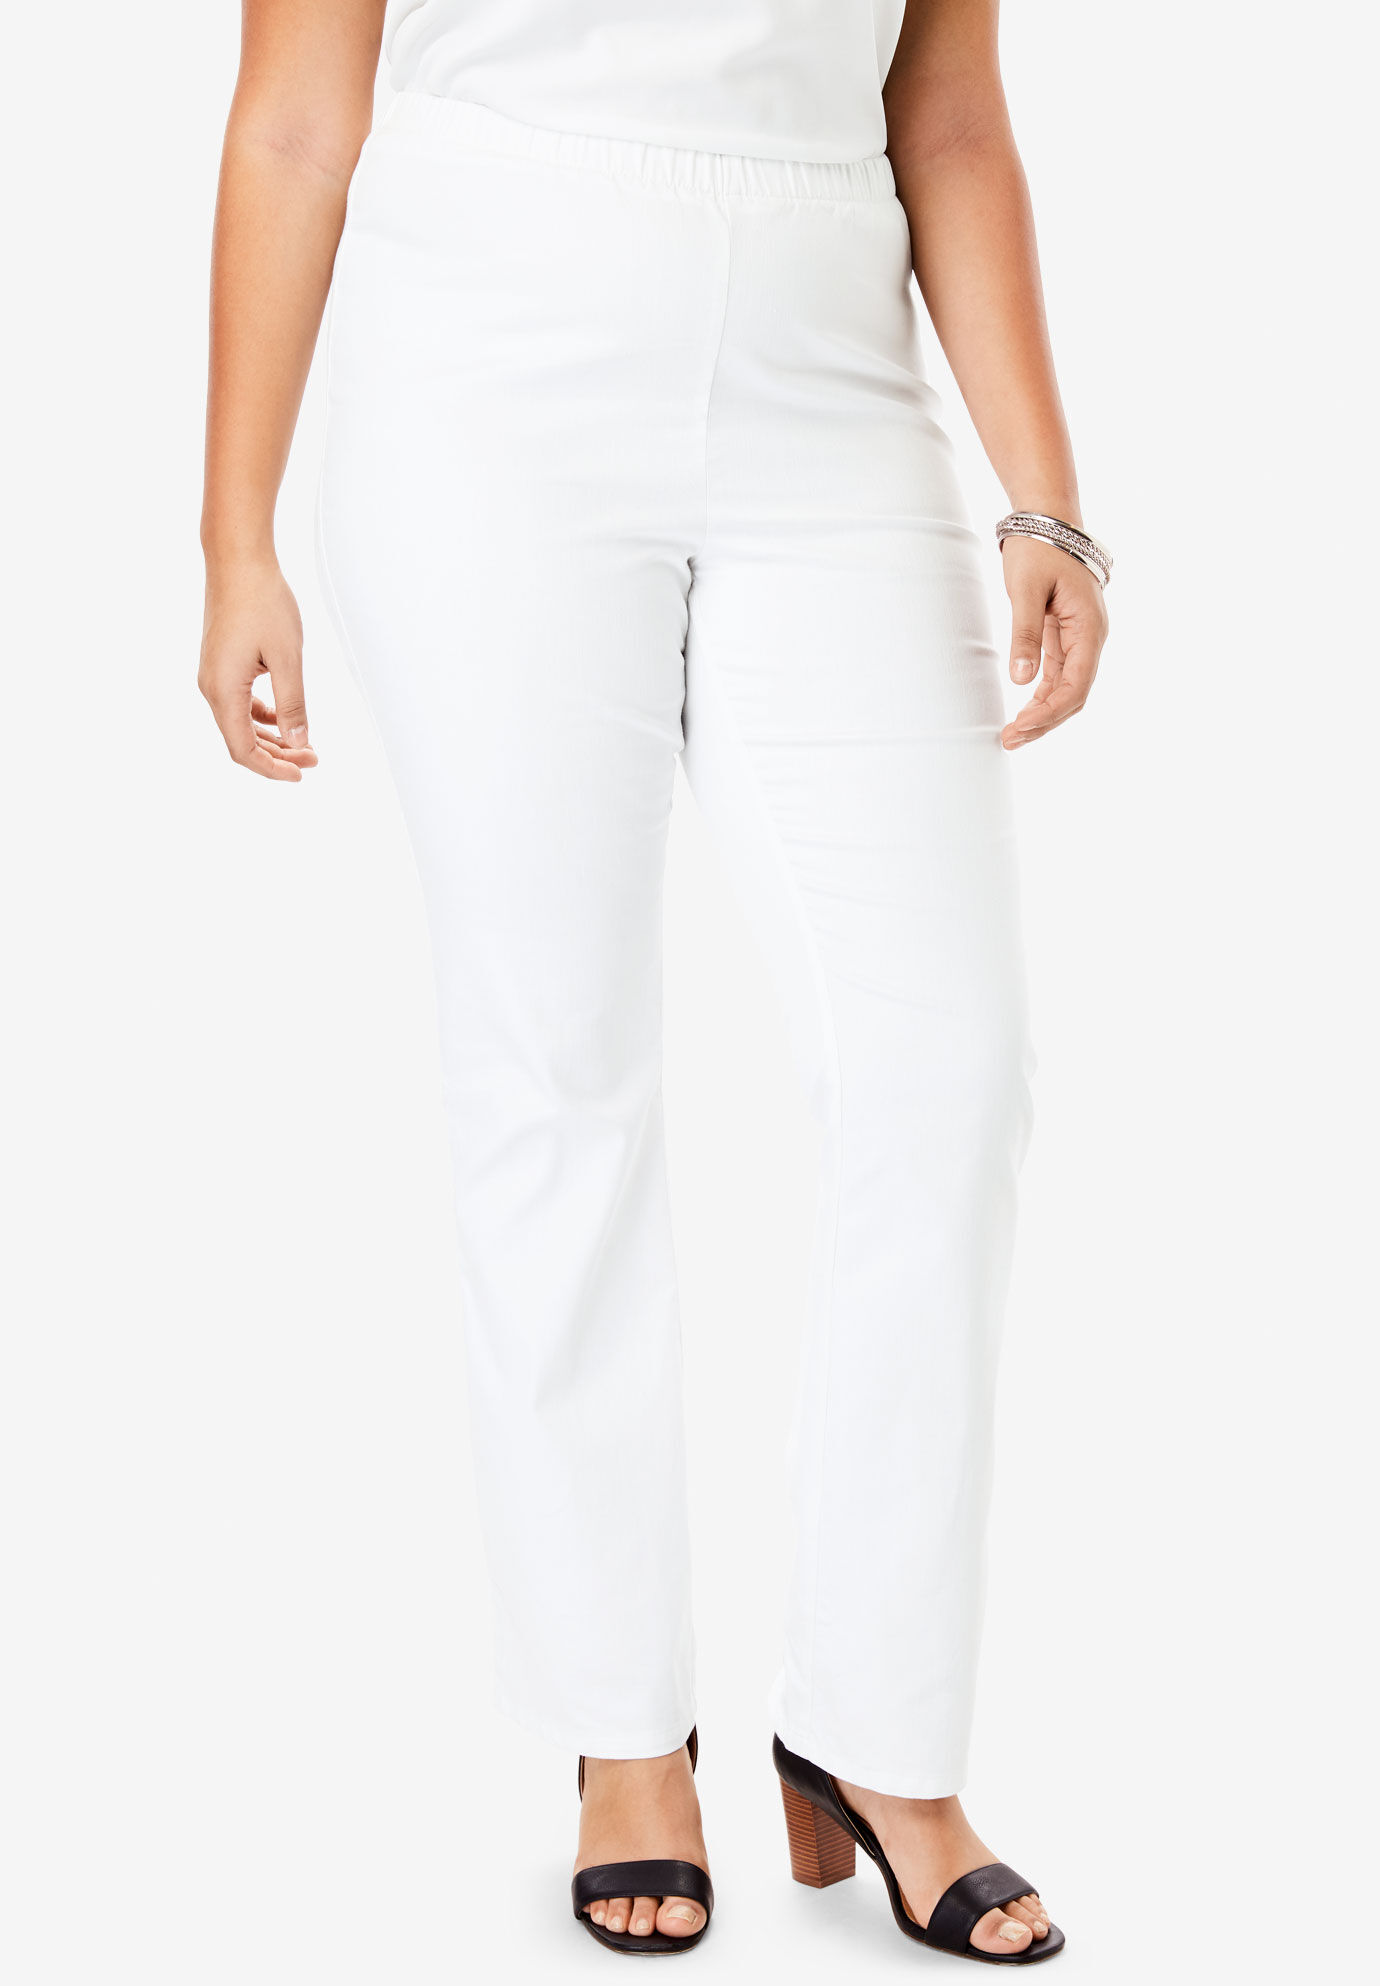 New Womens Plus Size Trousers Ladies Chains Paisley Tassels Print Pants Bottoms